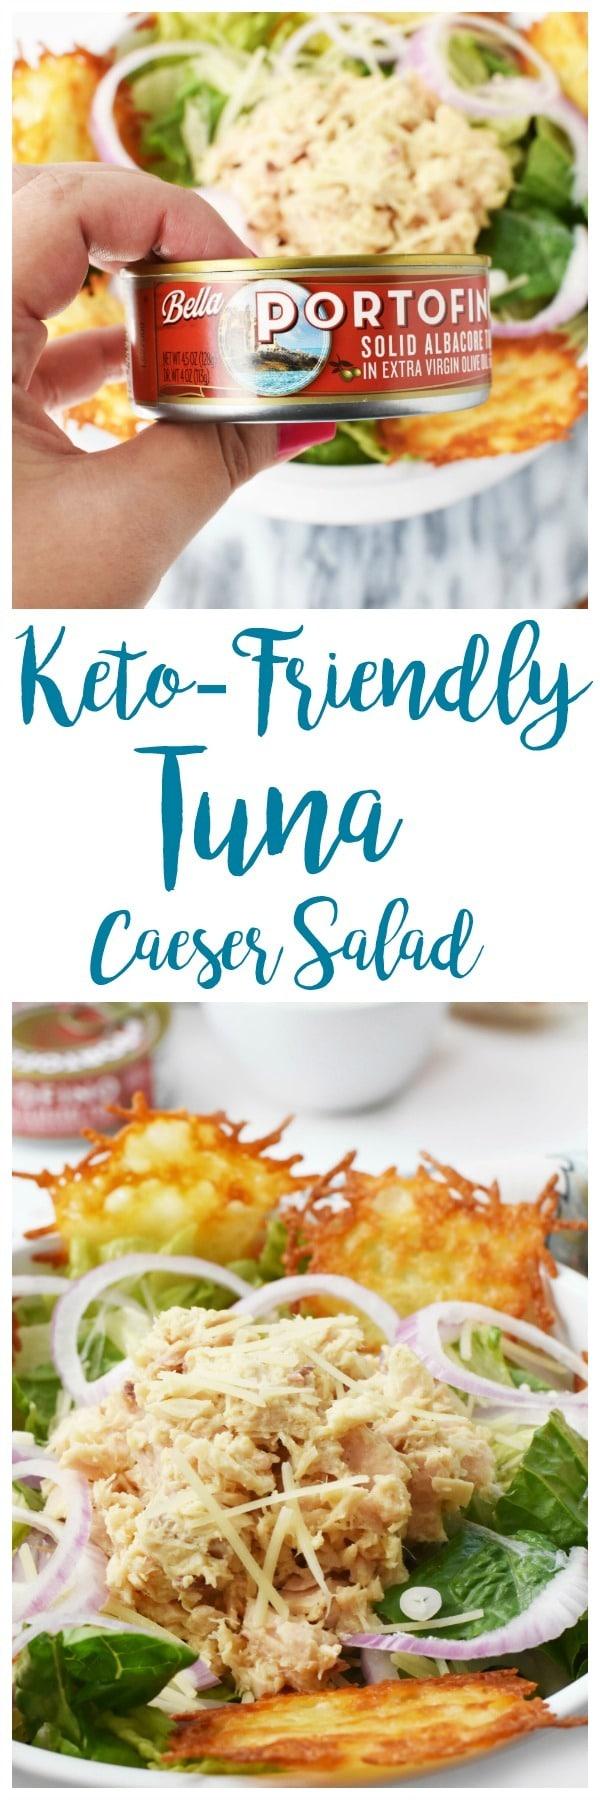 Keto-Friendly Tuna Caesar Salad